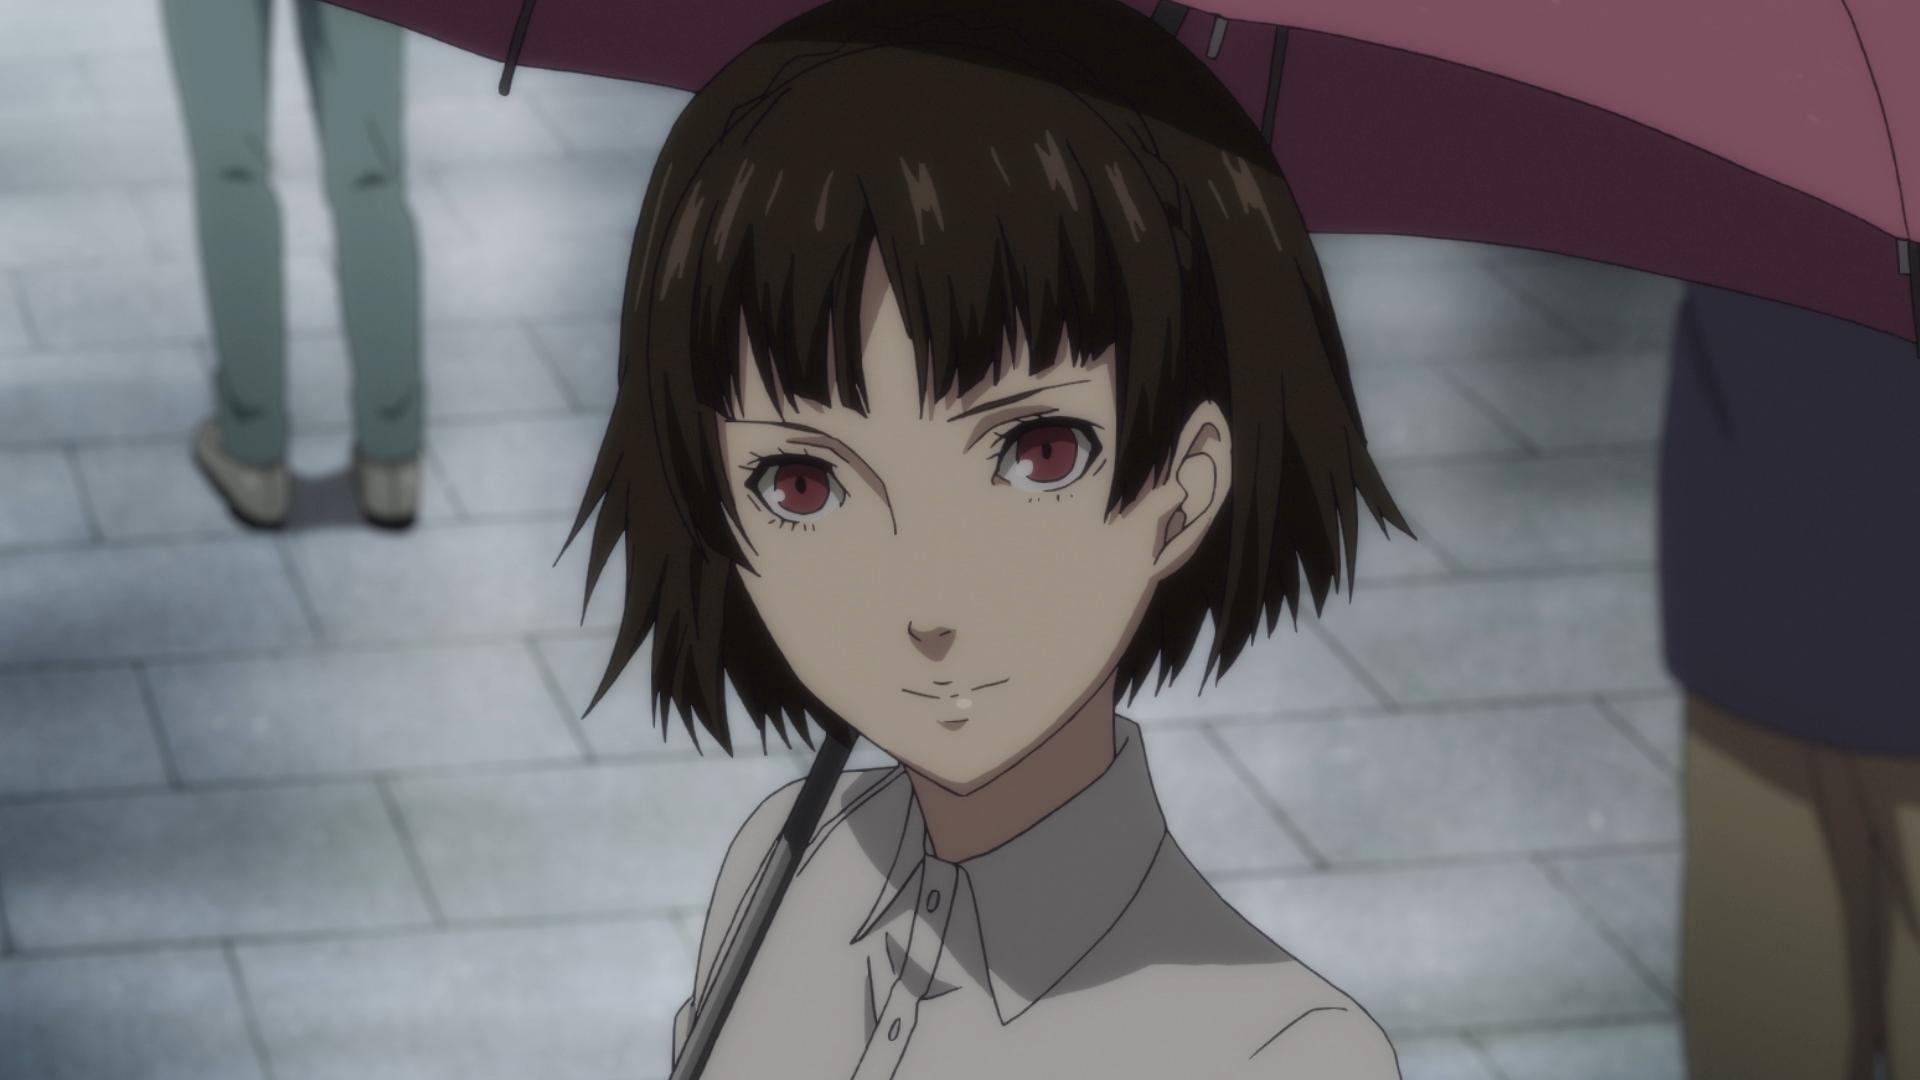 Pin by mozn on anime Persona 5 makoto, Persona 5, Persona